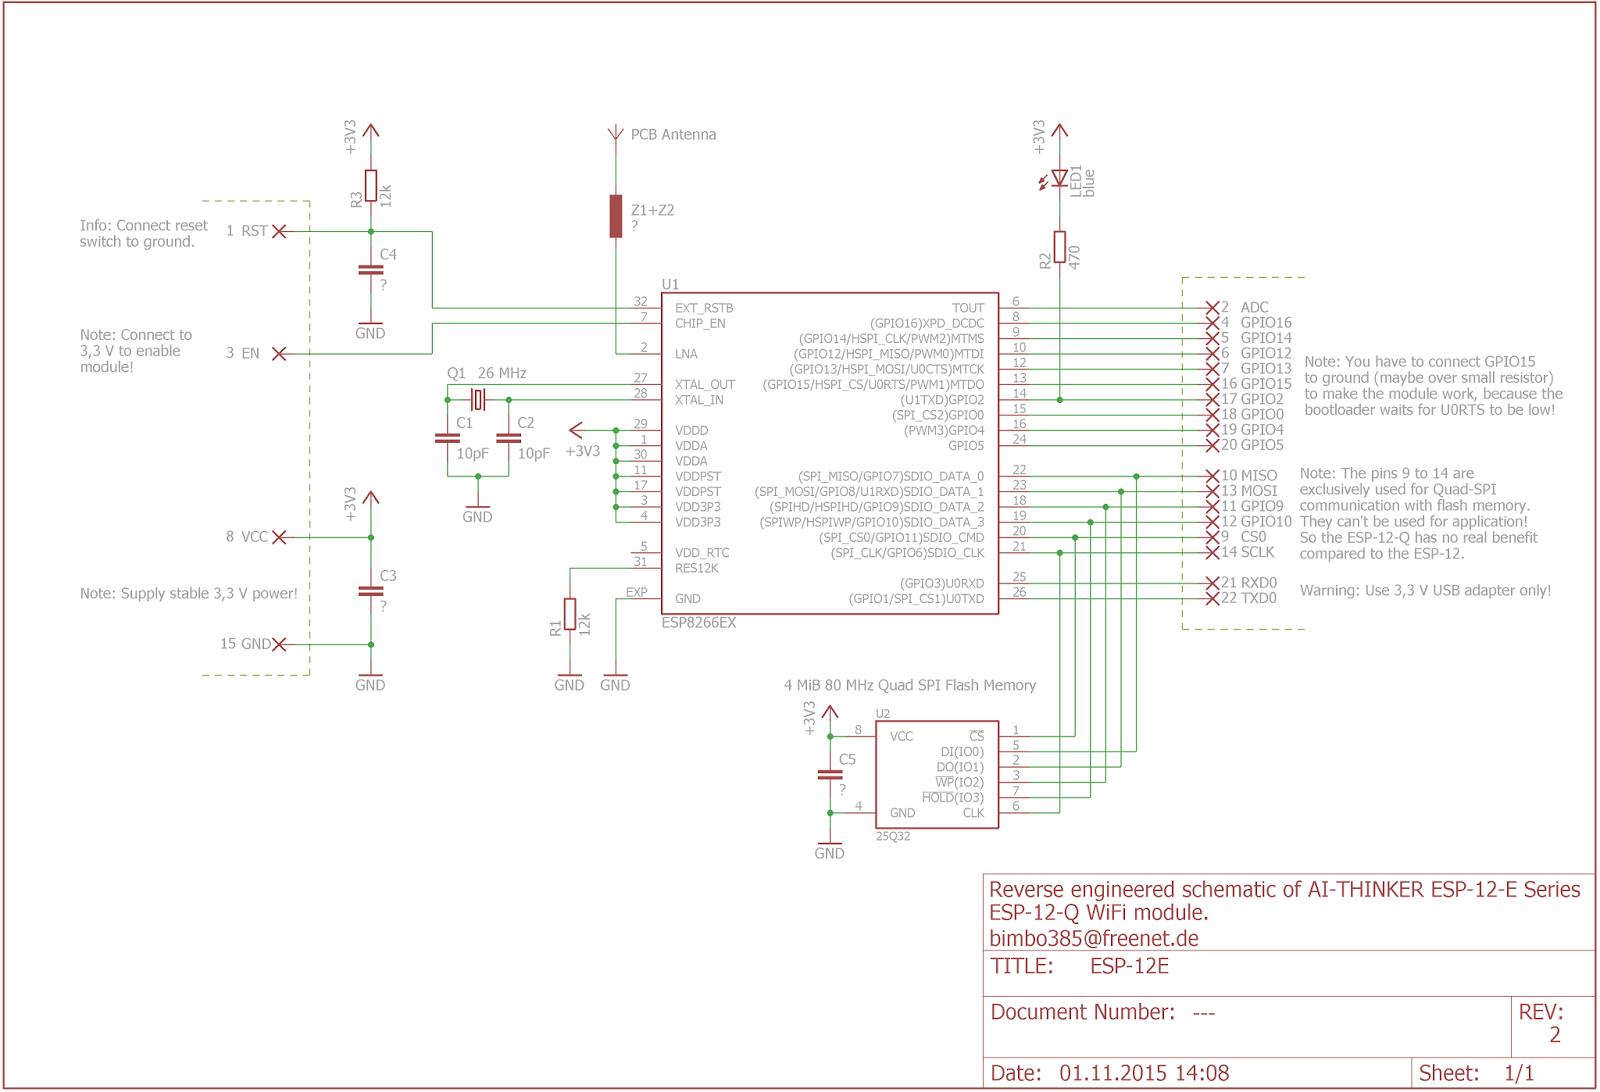 Return 0 Framework Platformio Geany Raspberry Pi